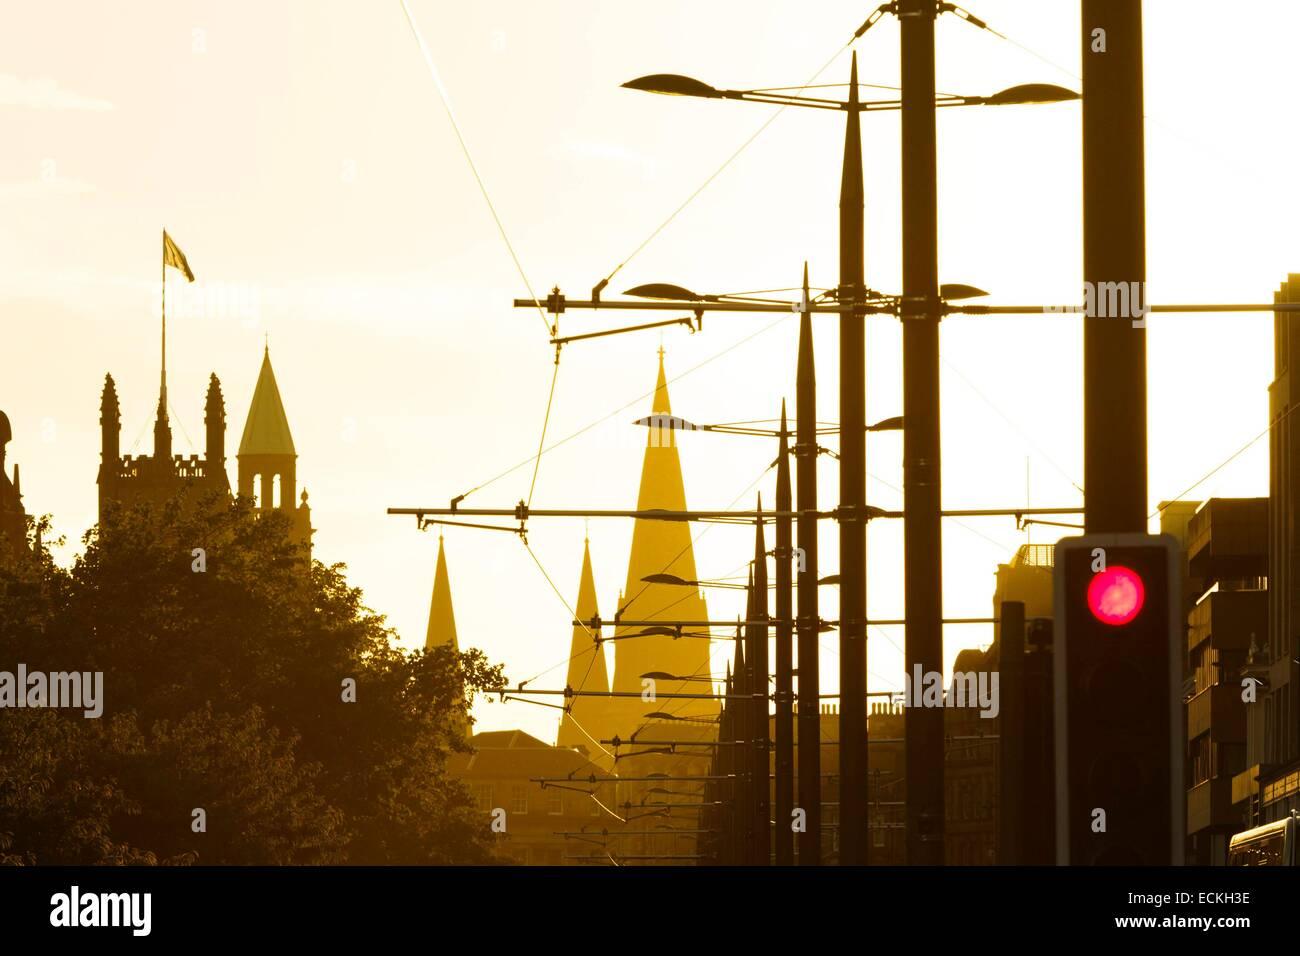 United Kingdom, Scotland, Edinburg, Princes Street, Days against an avenue of downtown at sunset - Stock Image